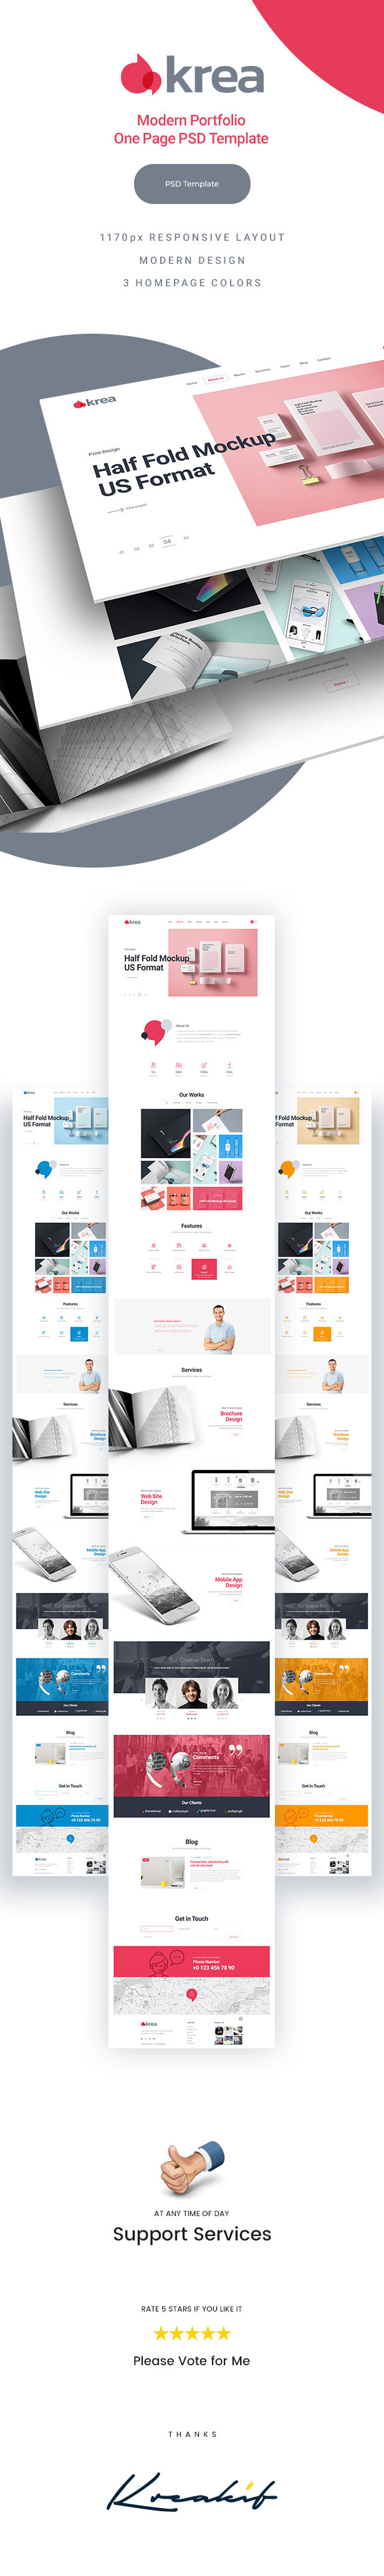 Krea - Modern Portfolio One Page PSD Web Template - 1